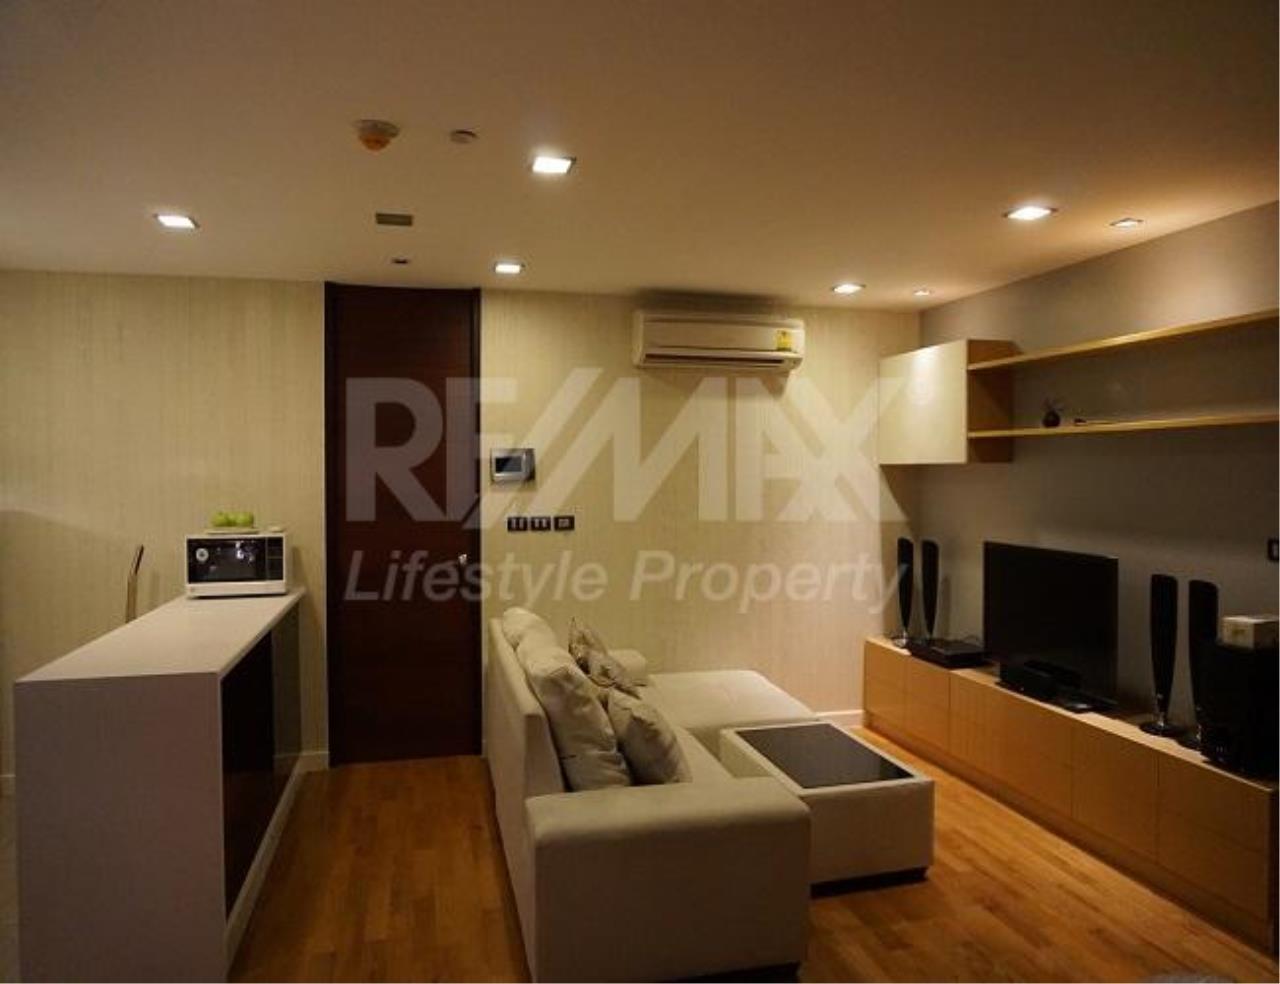 RE/MAX LifeStyle Property Agency's Quad Silom 2